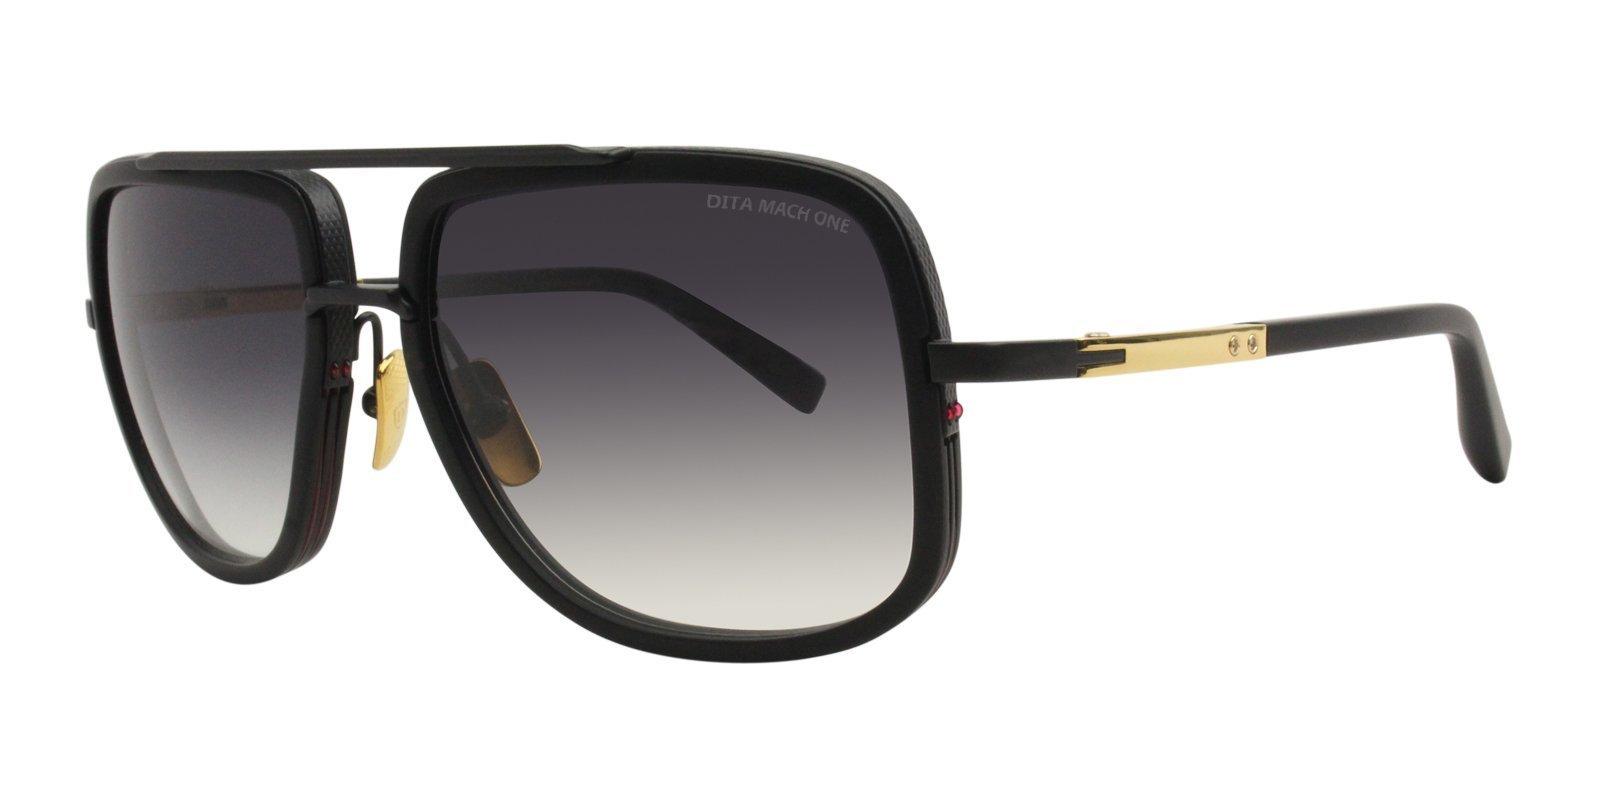 4ae638a072 Dita - Mach One Black - Gray sunglasses